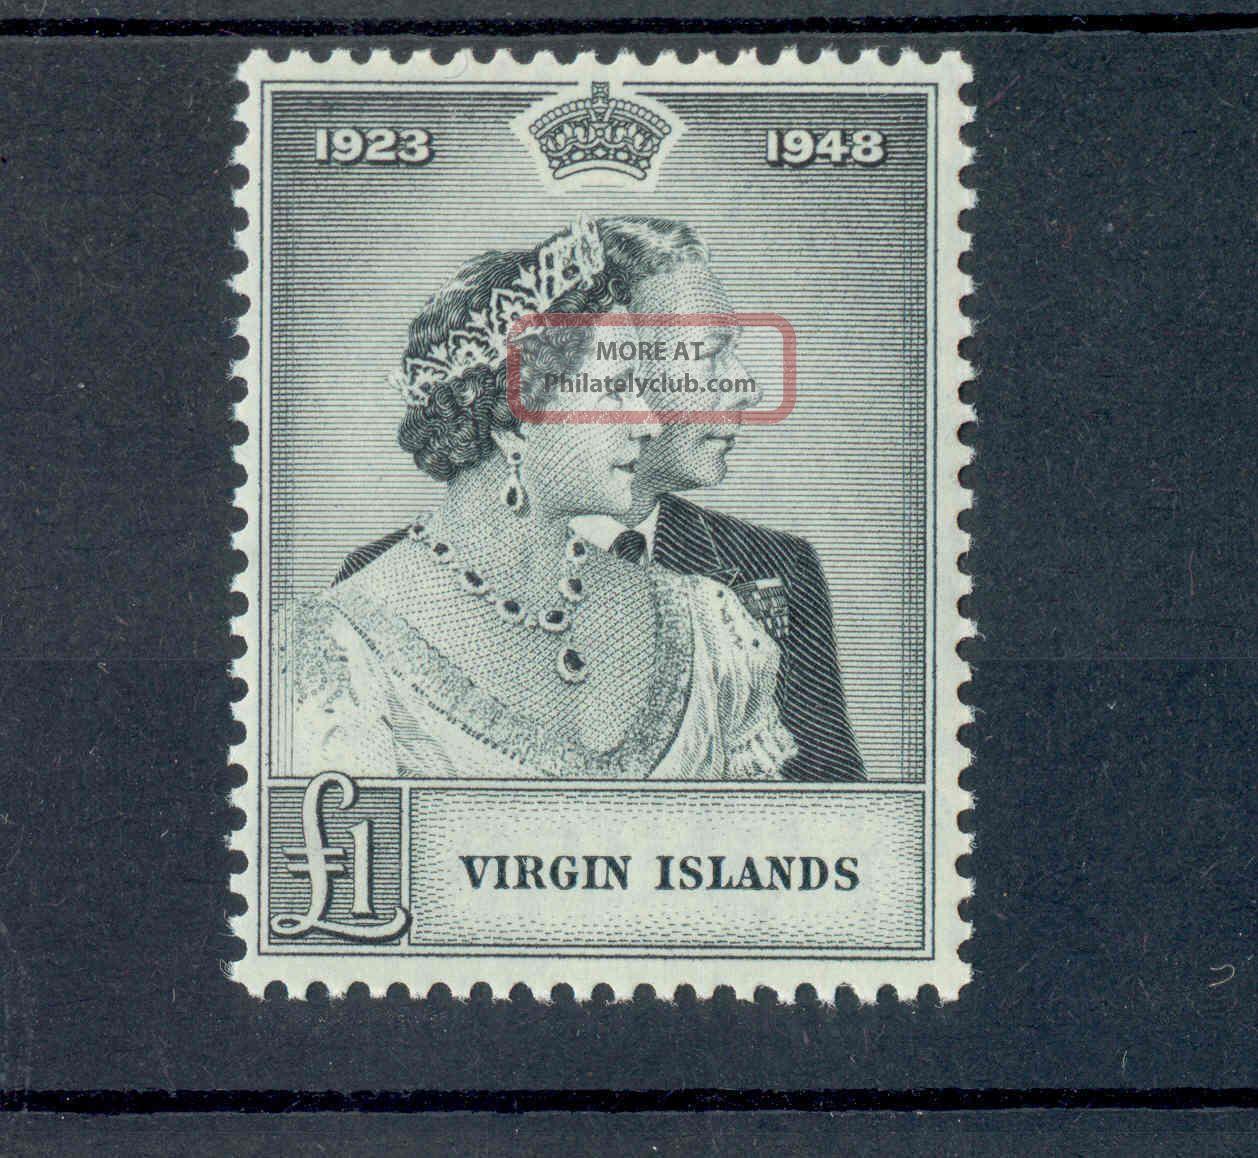 Virgin Islands Kgvi 1949 Rsw £1 Black Sg125 British Colonies & Territories photo